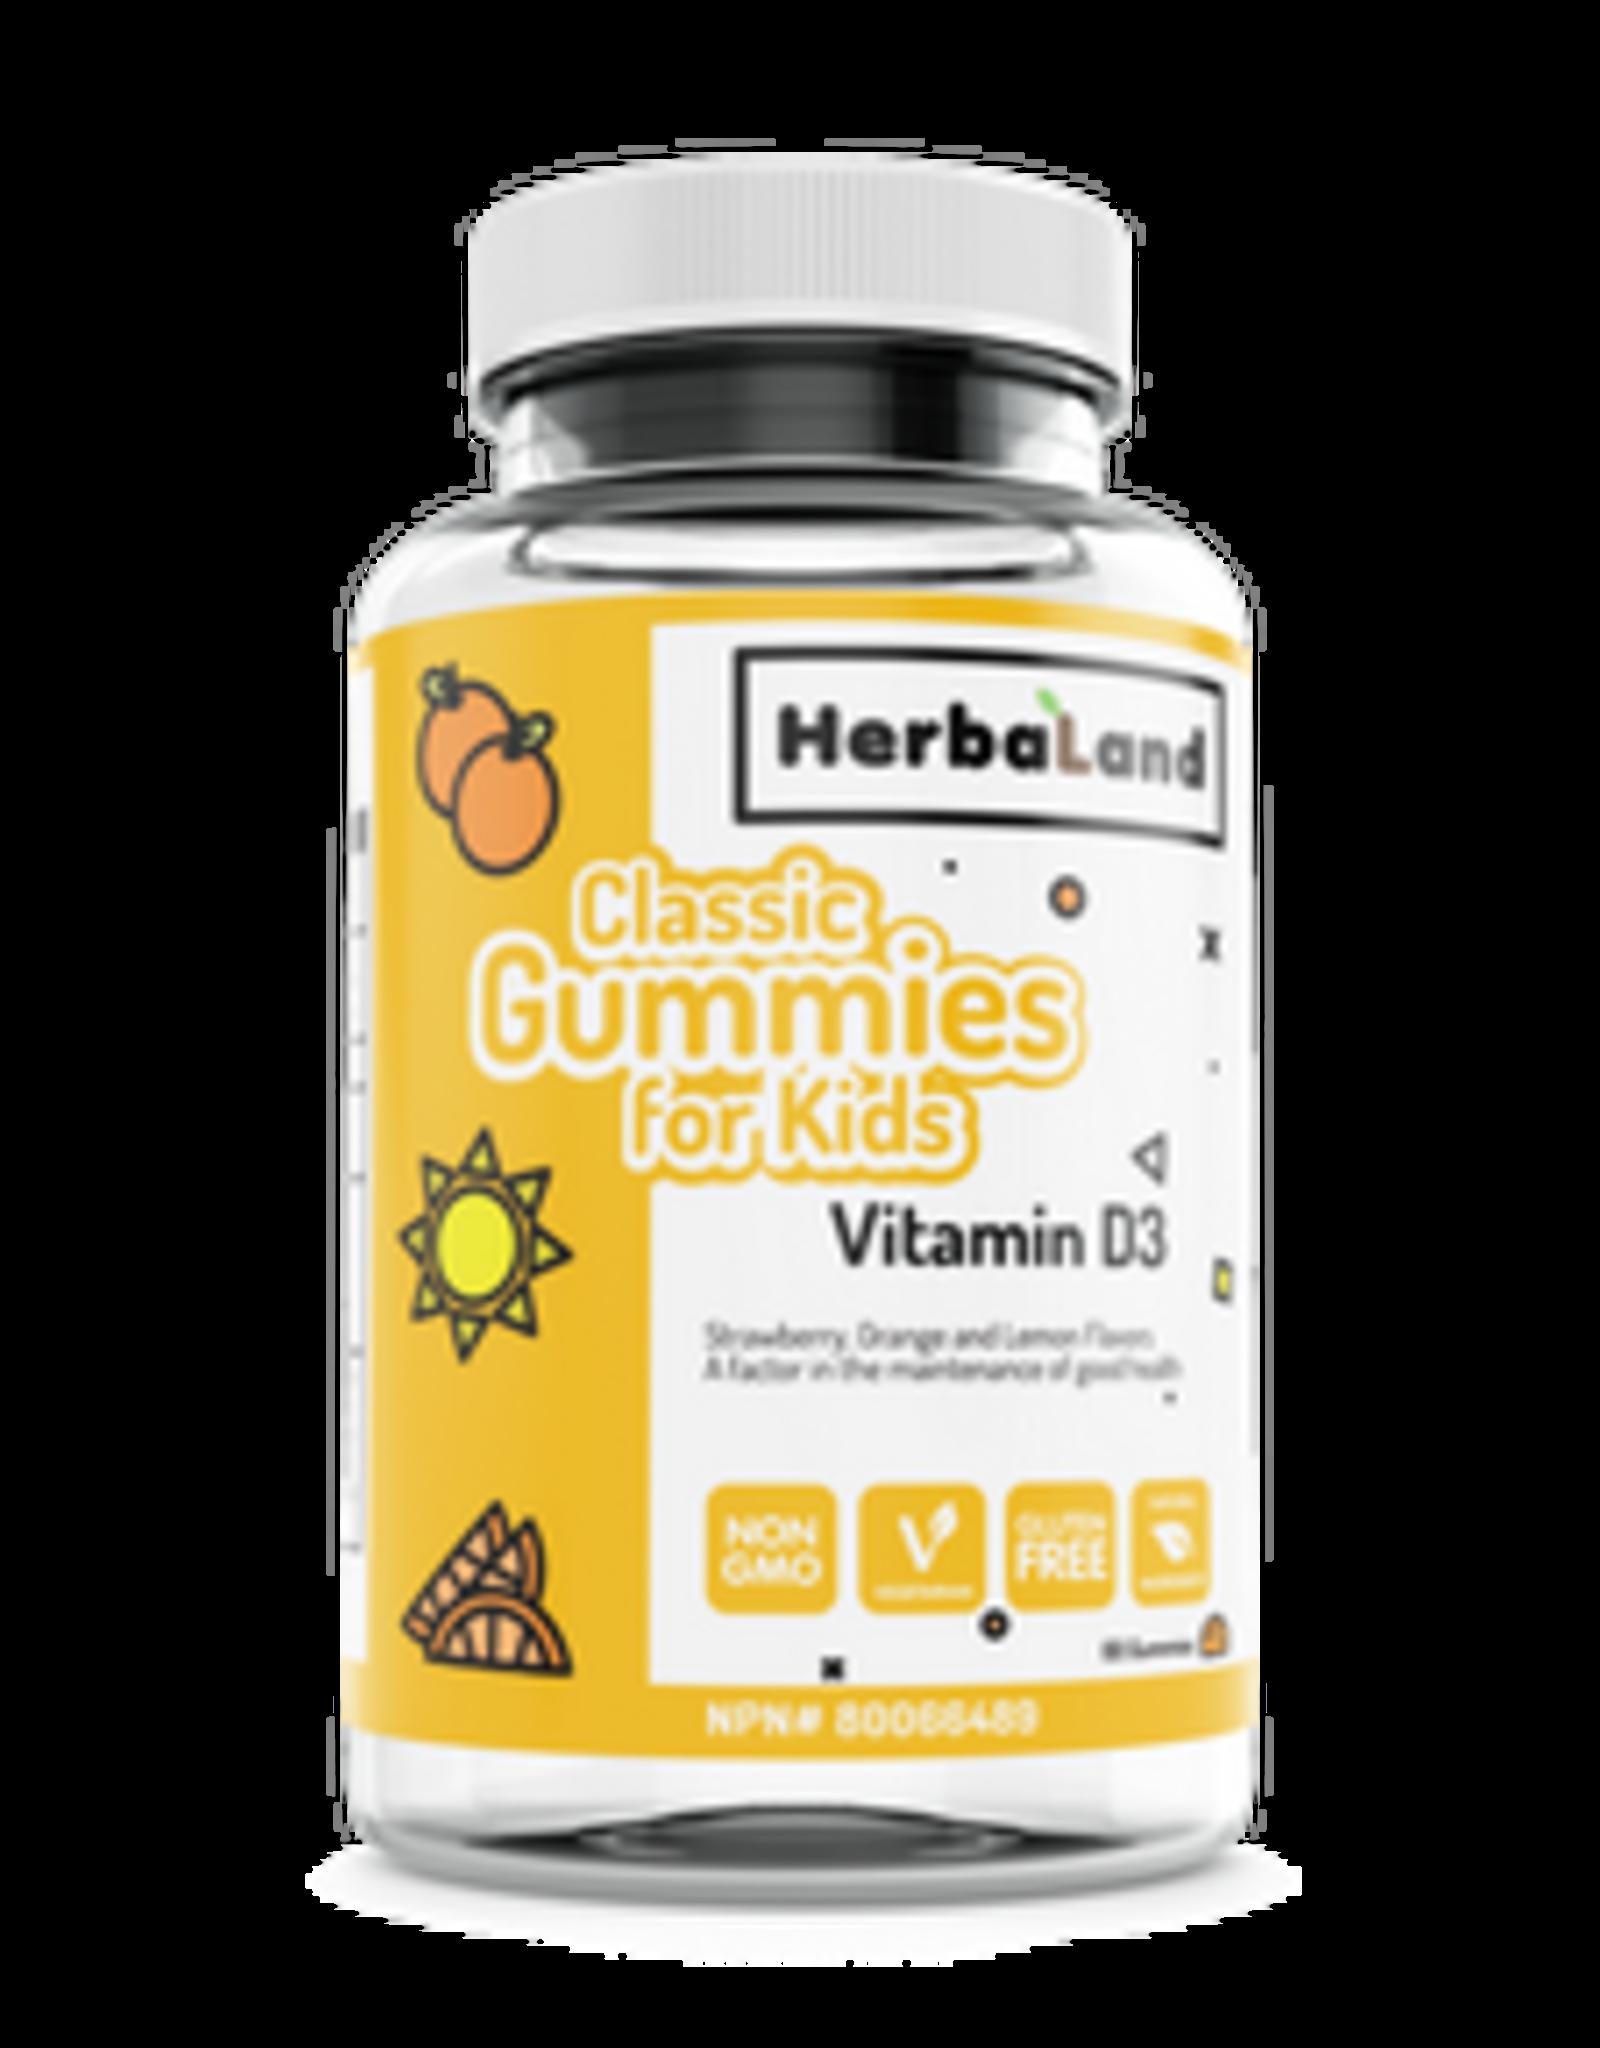 Herbaland Herbaland - Vitamine D3, Enfants (60caps)